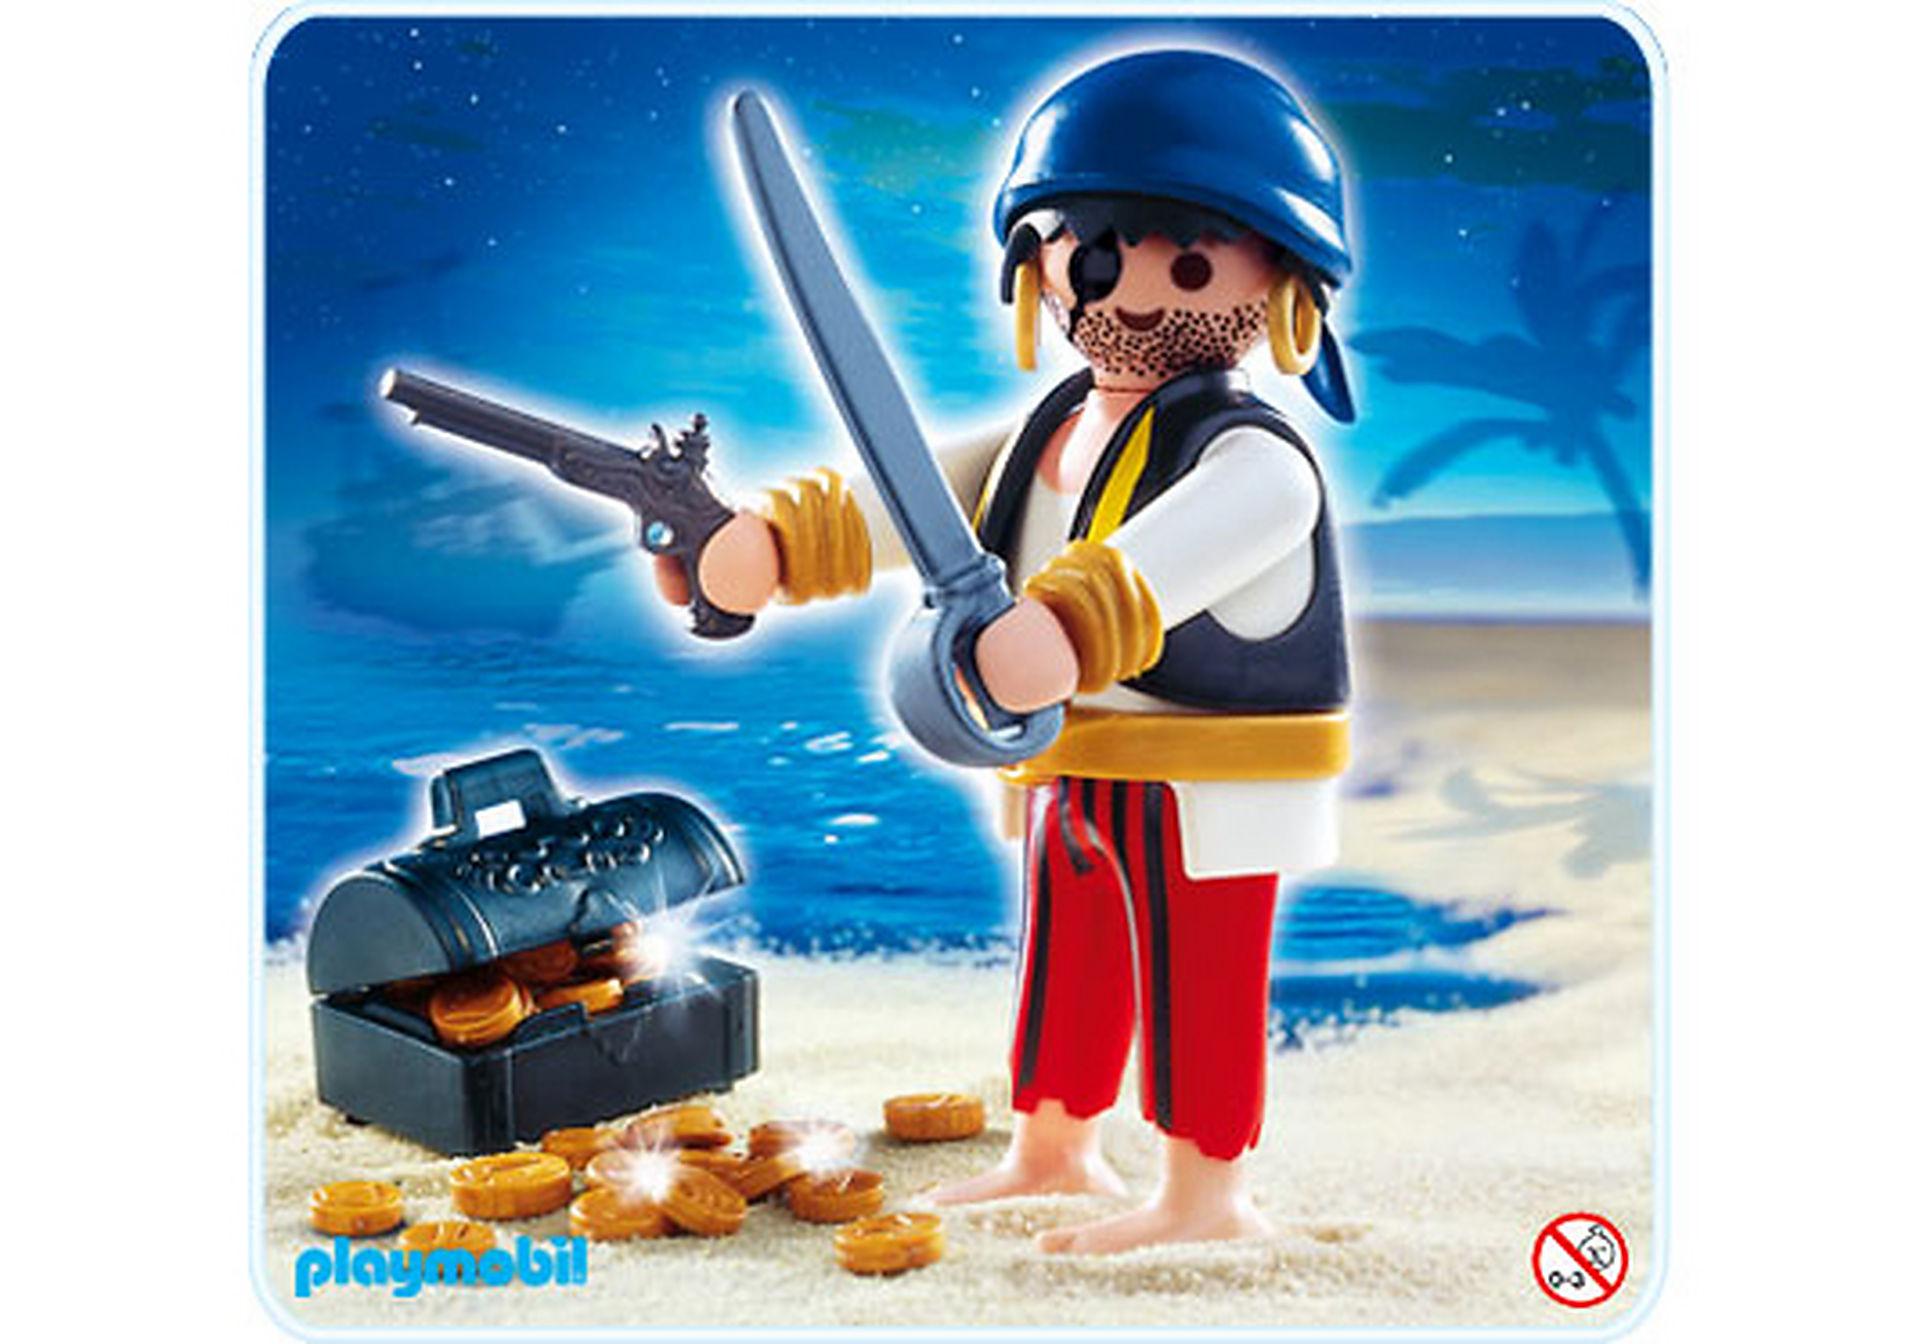 4662-A Pirat Einauge zoom image1